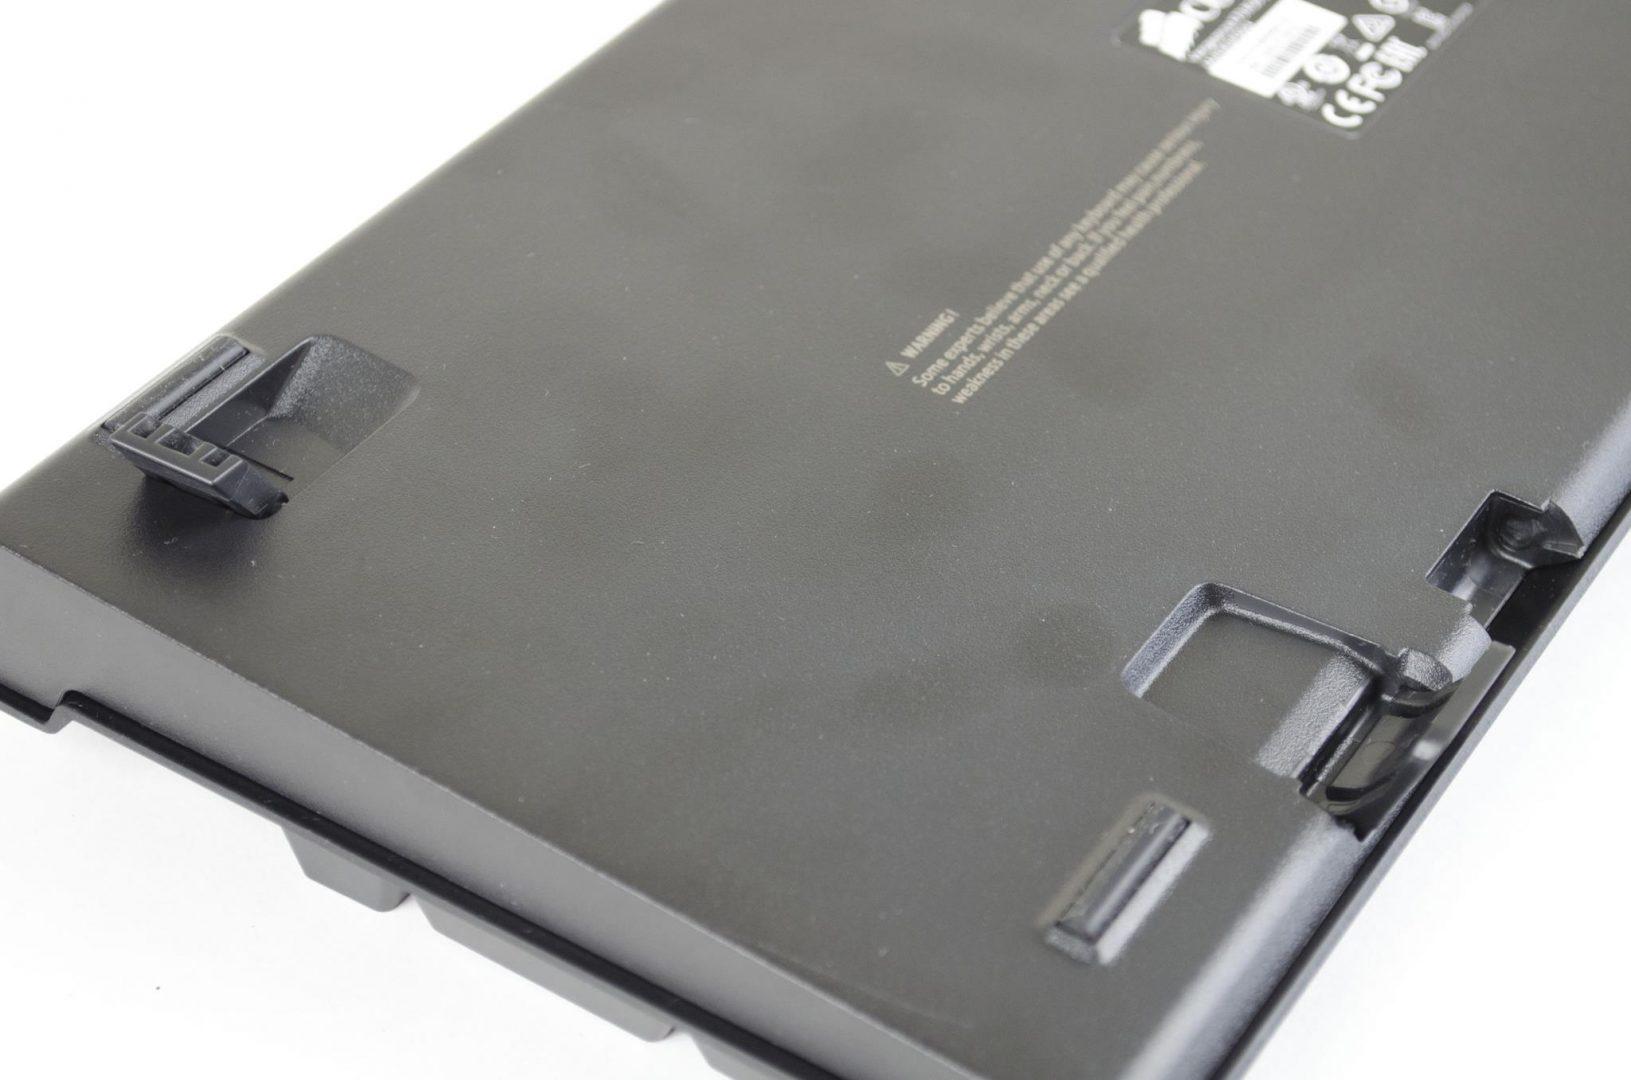 Corsair K70 RGB Mechanical Keyboard_13